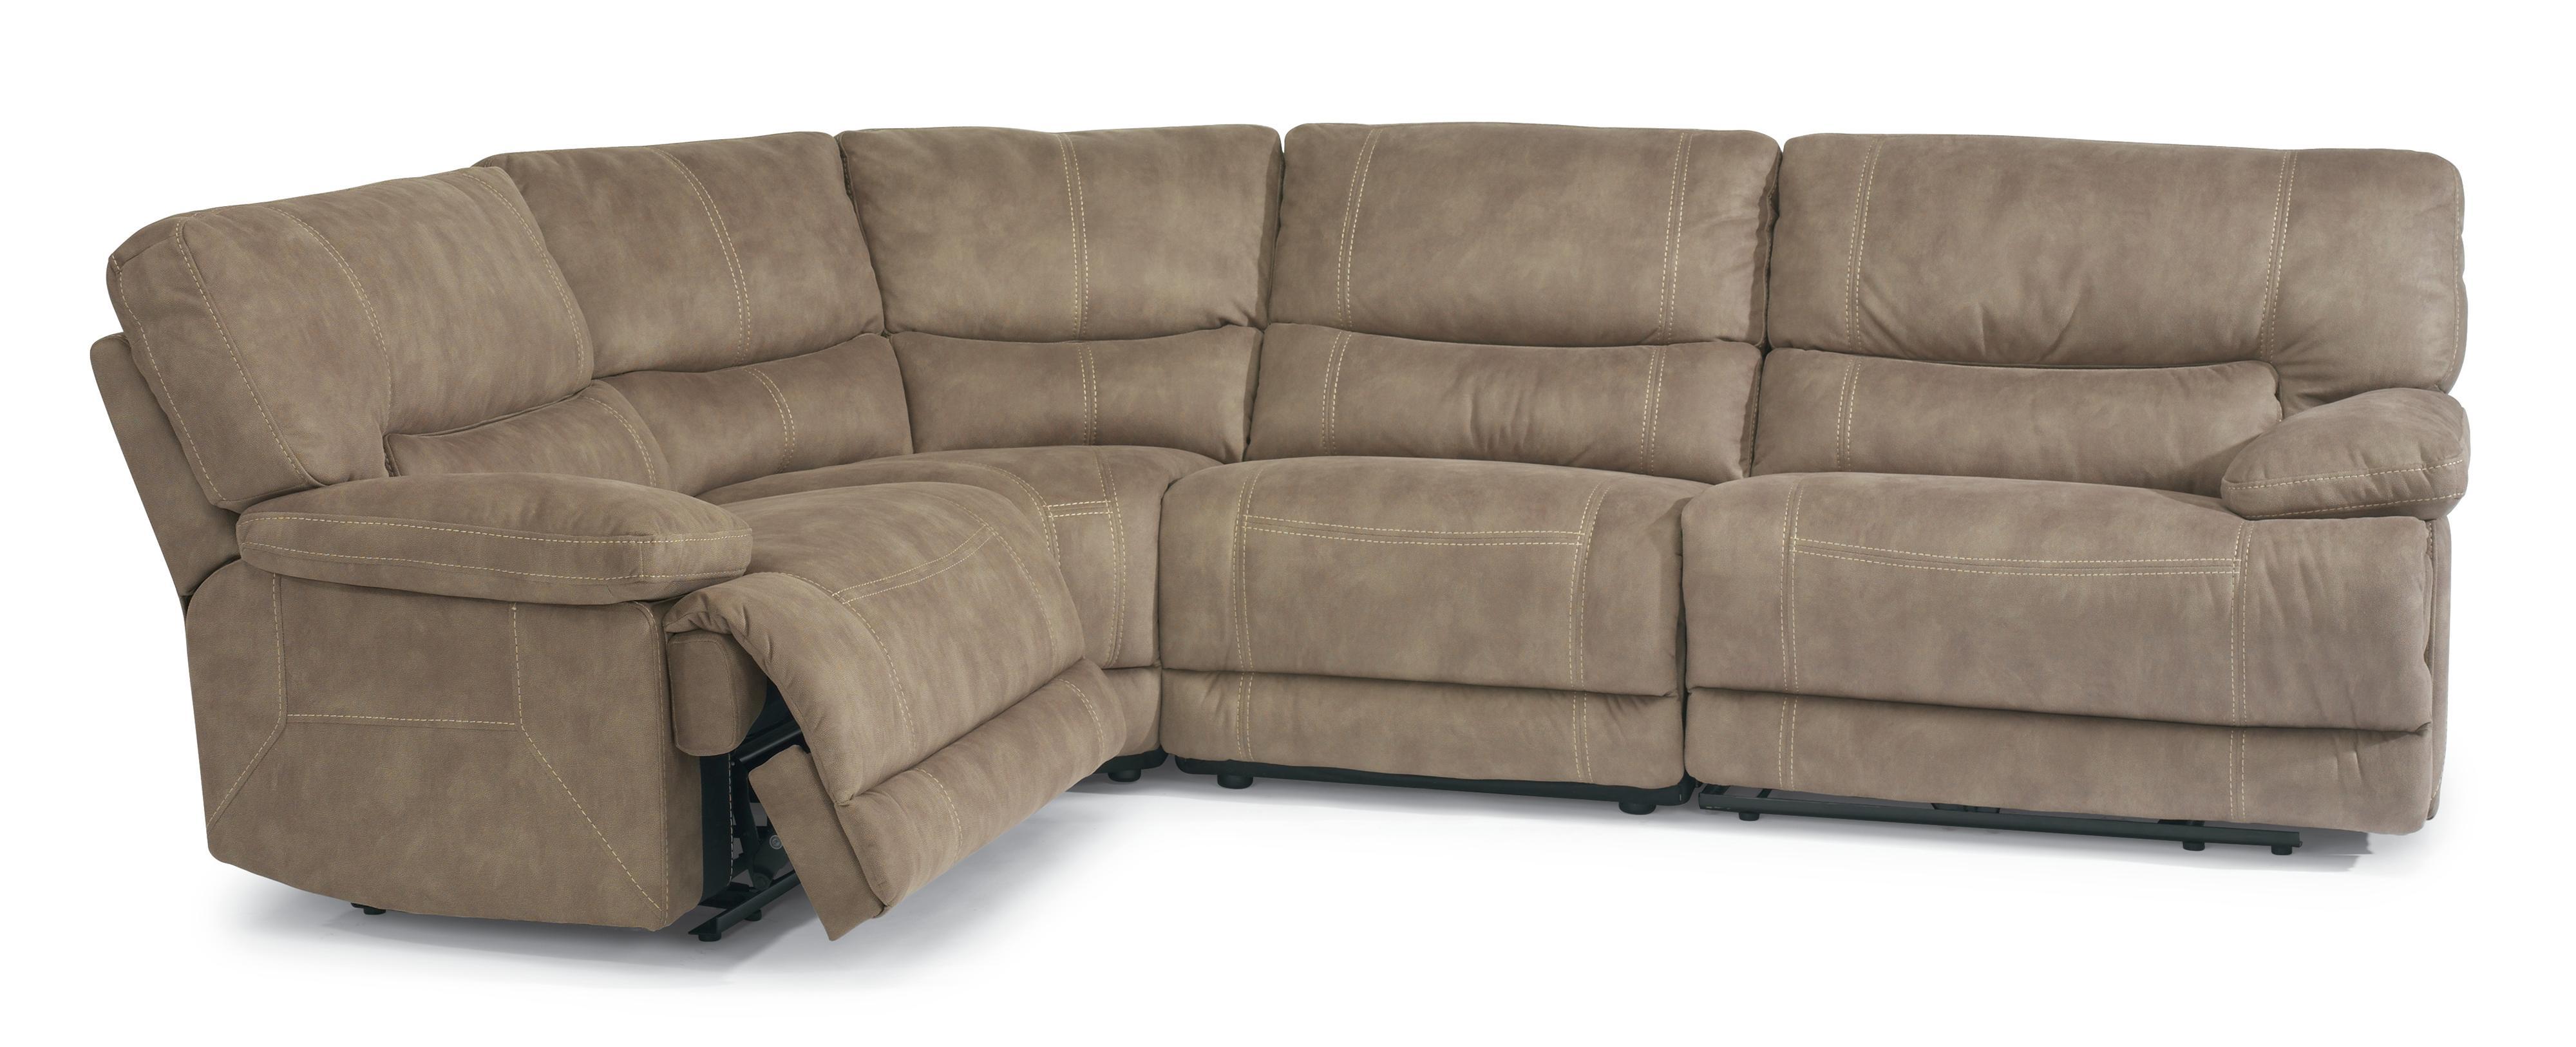 Flexsteel Latitudes Delia Reclining Sectional Sofa With